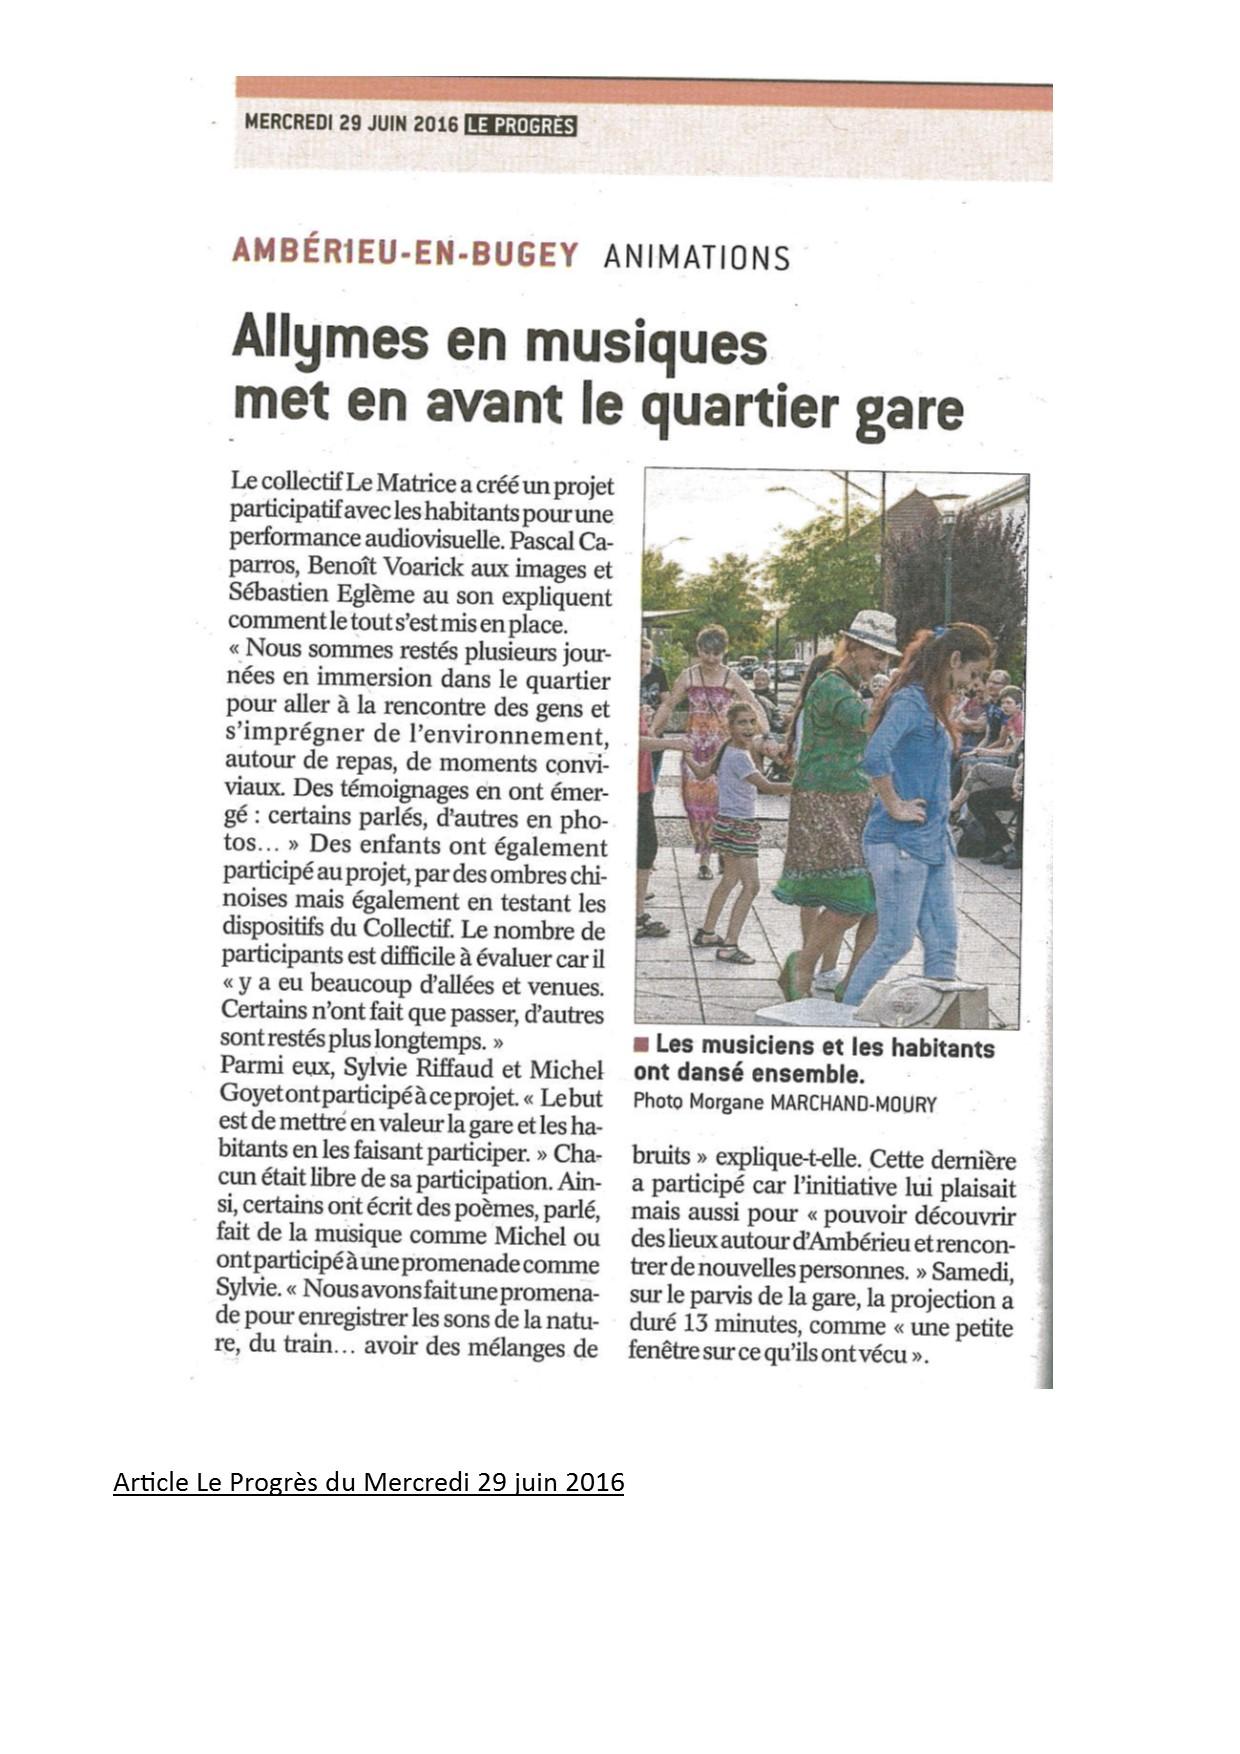 Allymes article du 29 juin